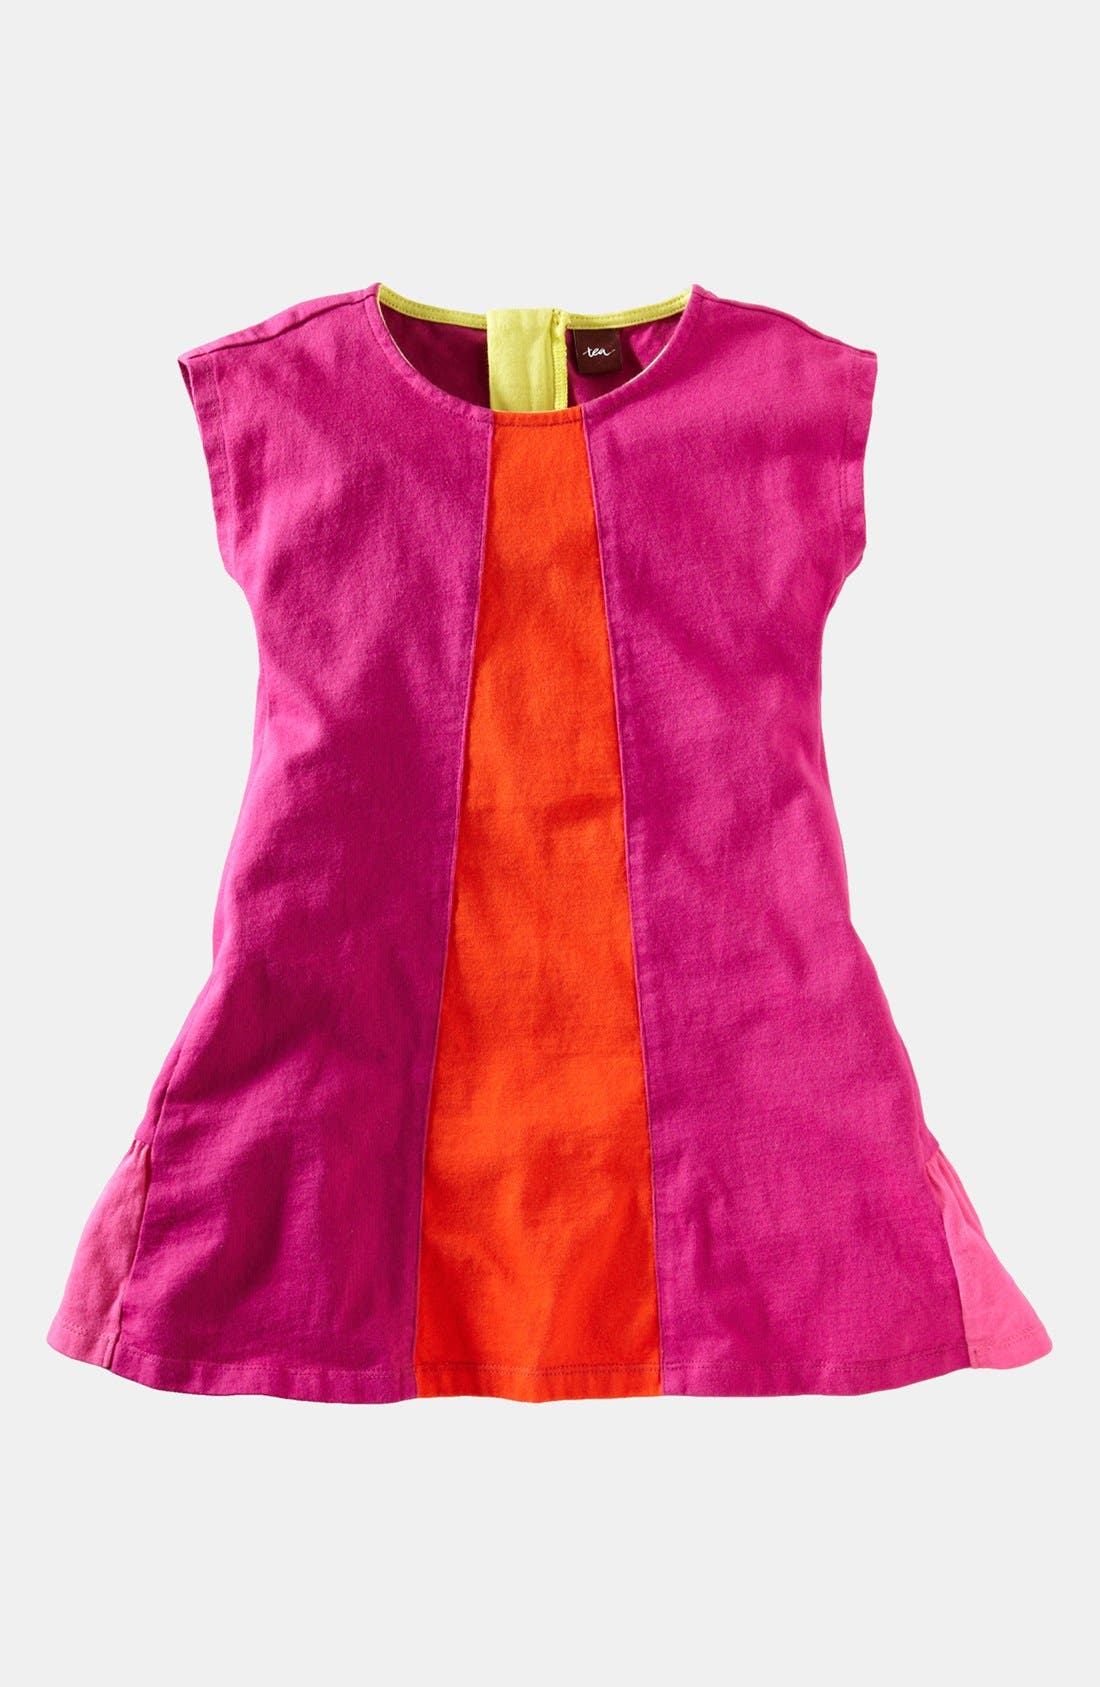 Main Image - Tea Collection Colorblock Dress (Baby Girls)